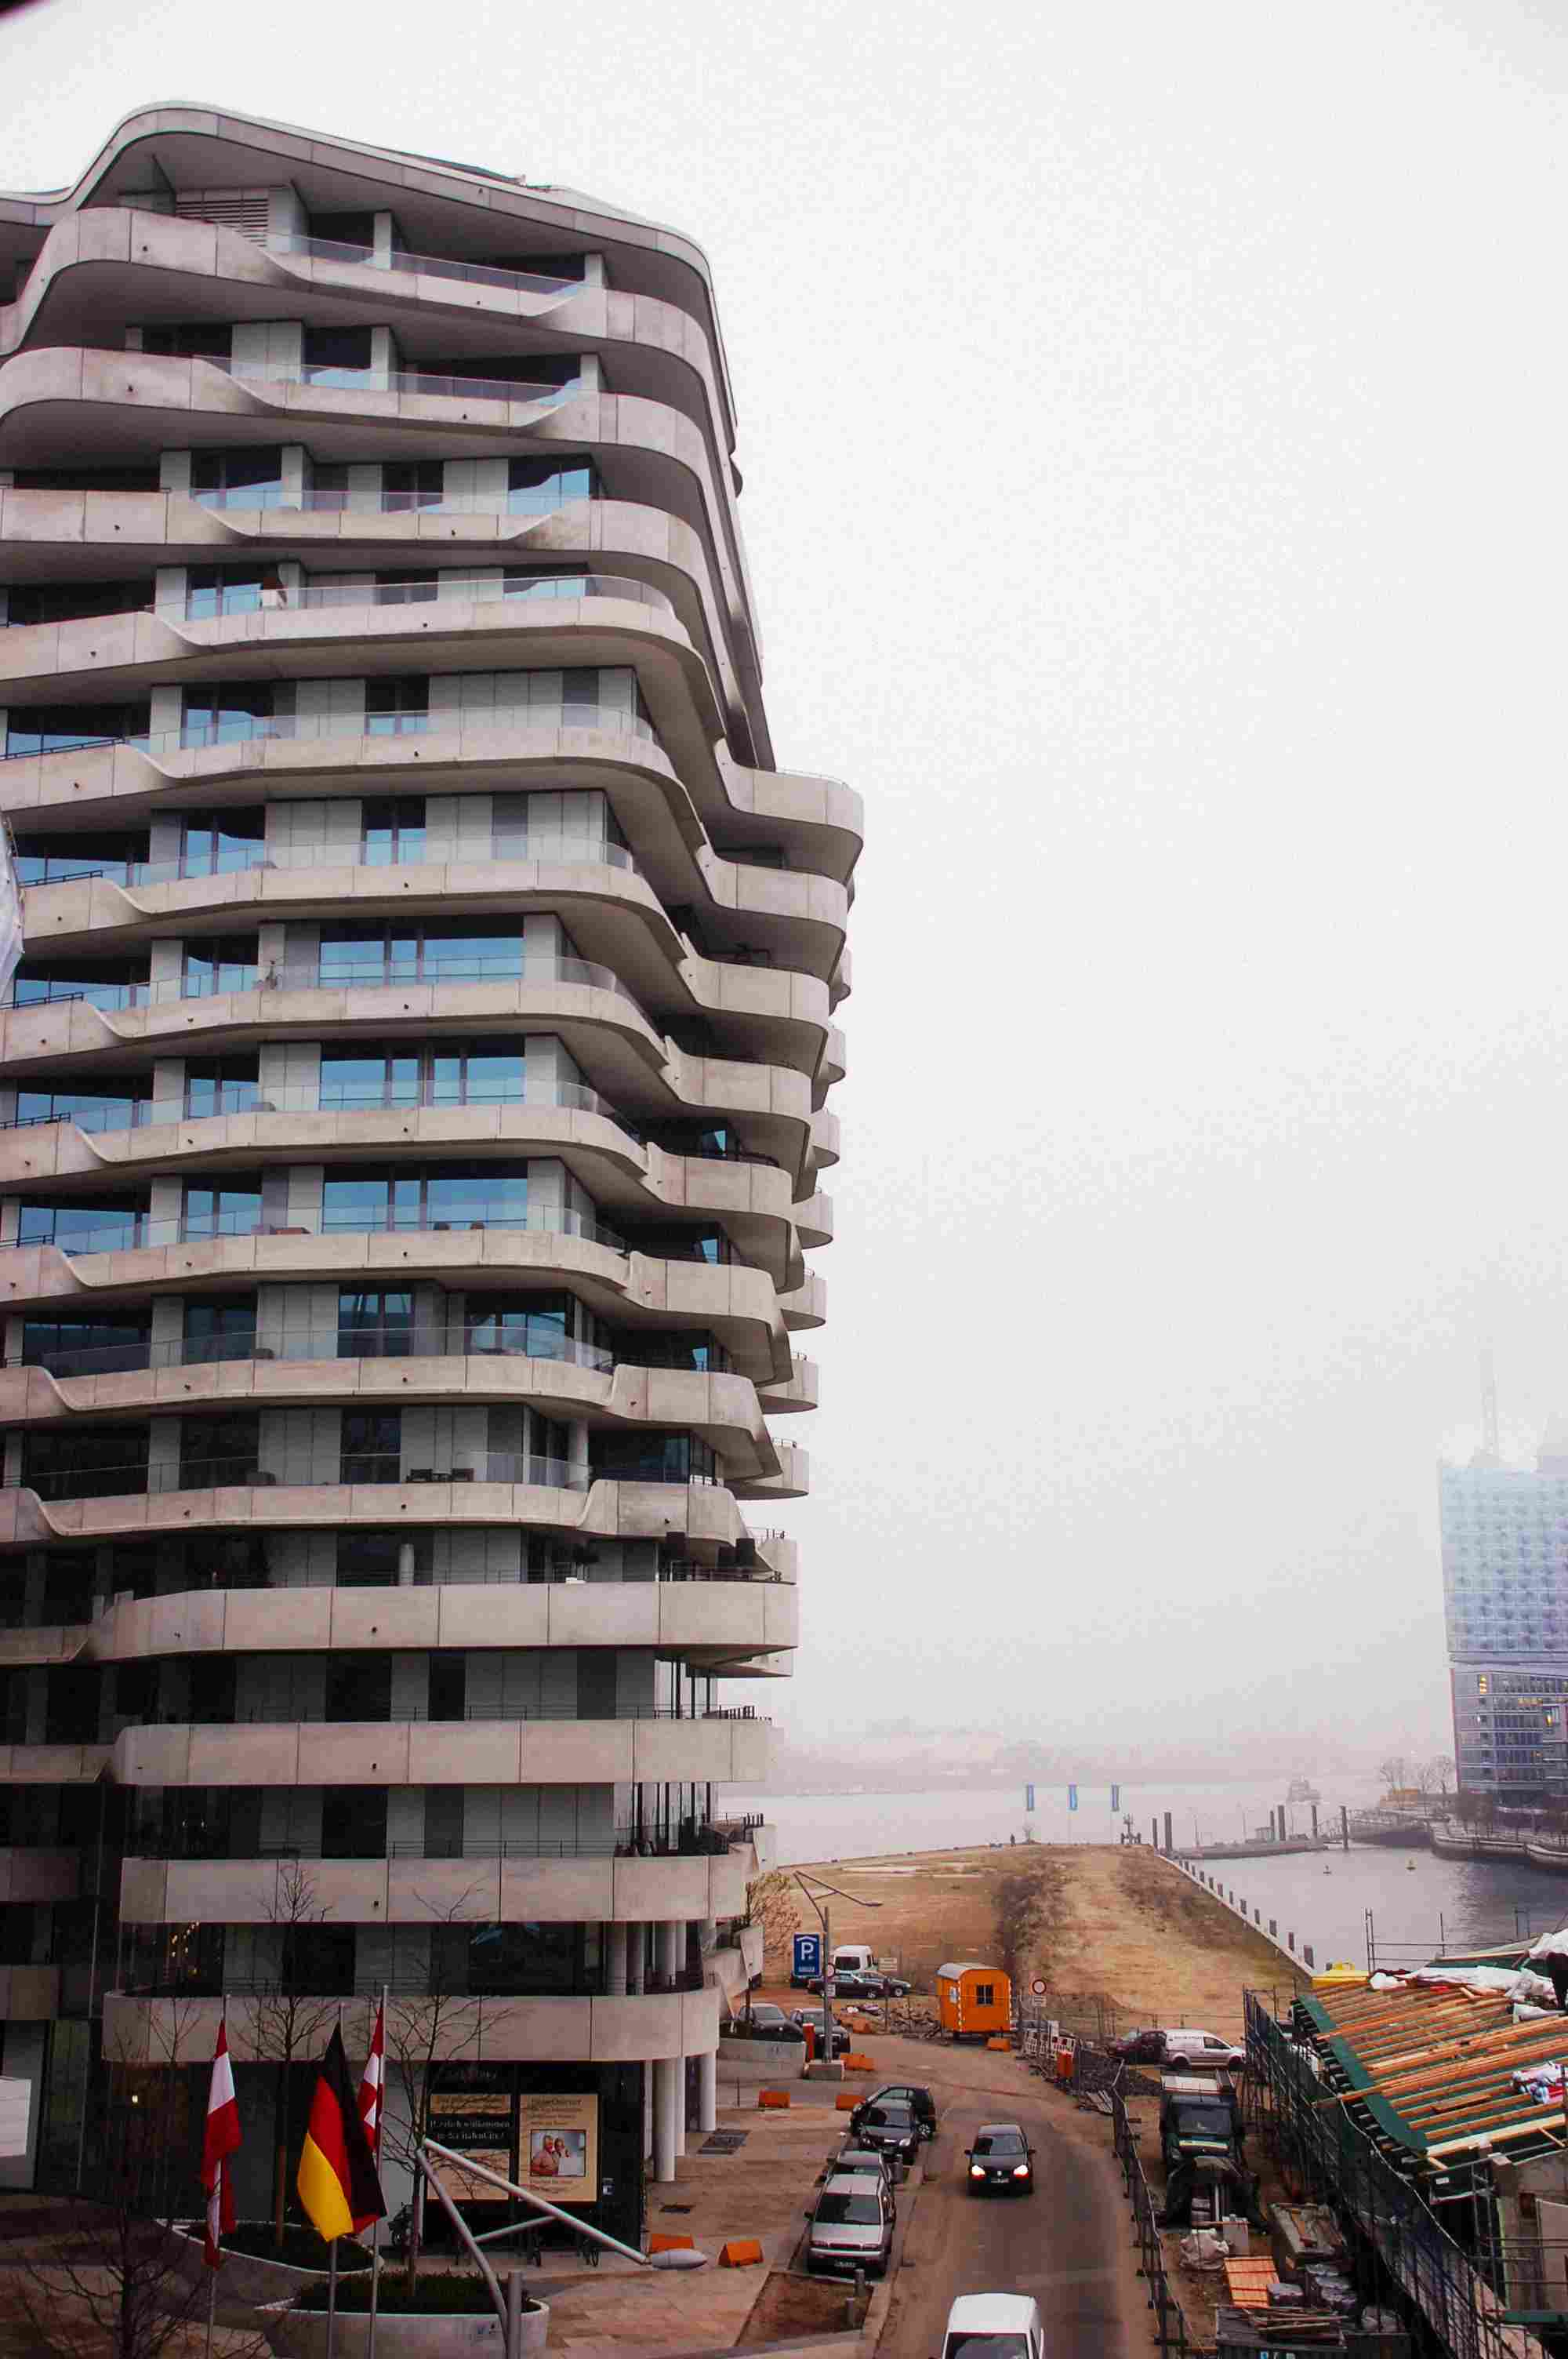 Hamburg's Hafencity building